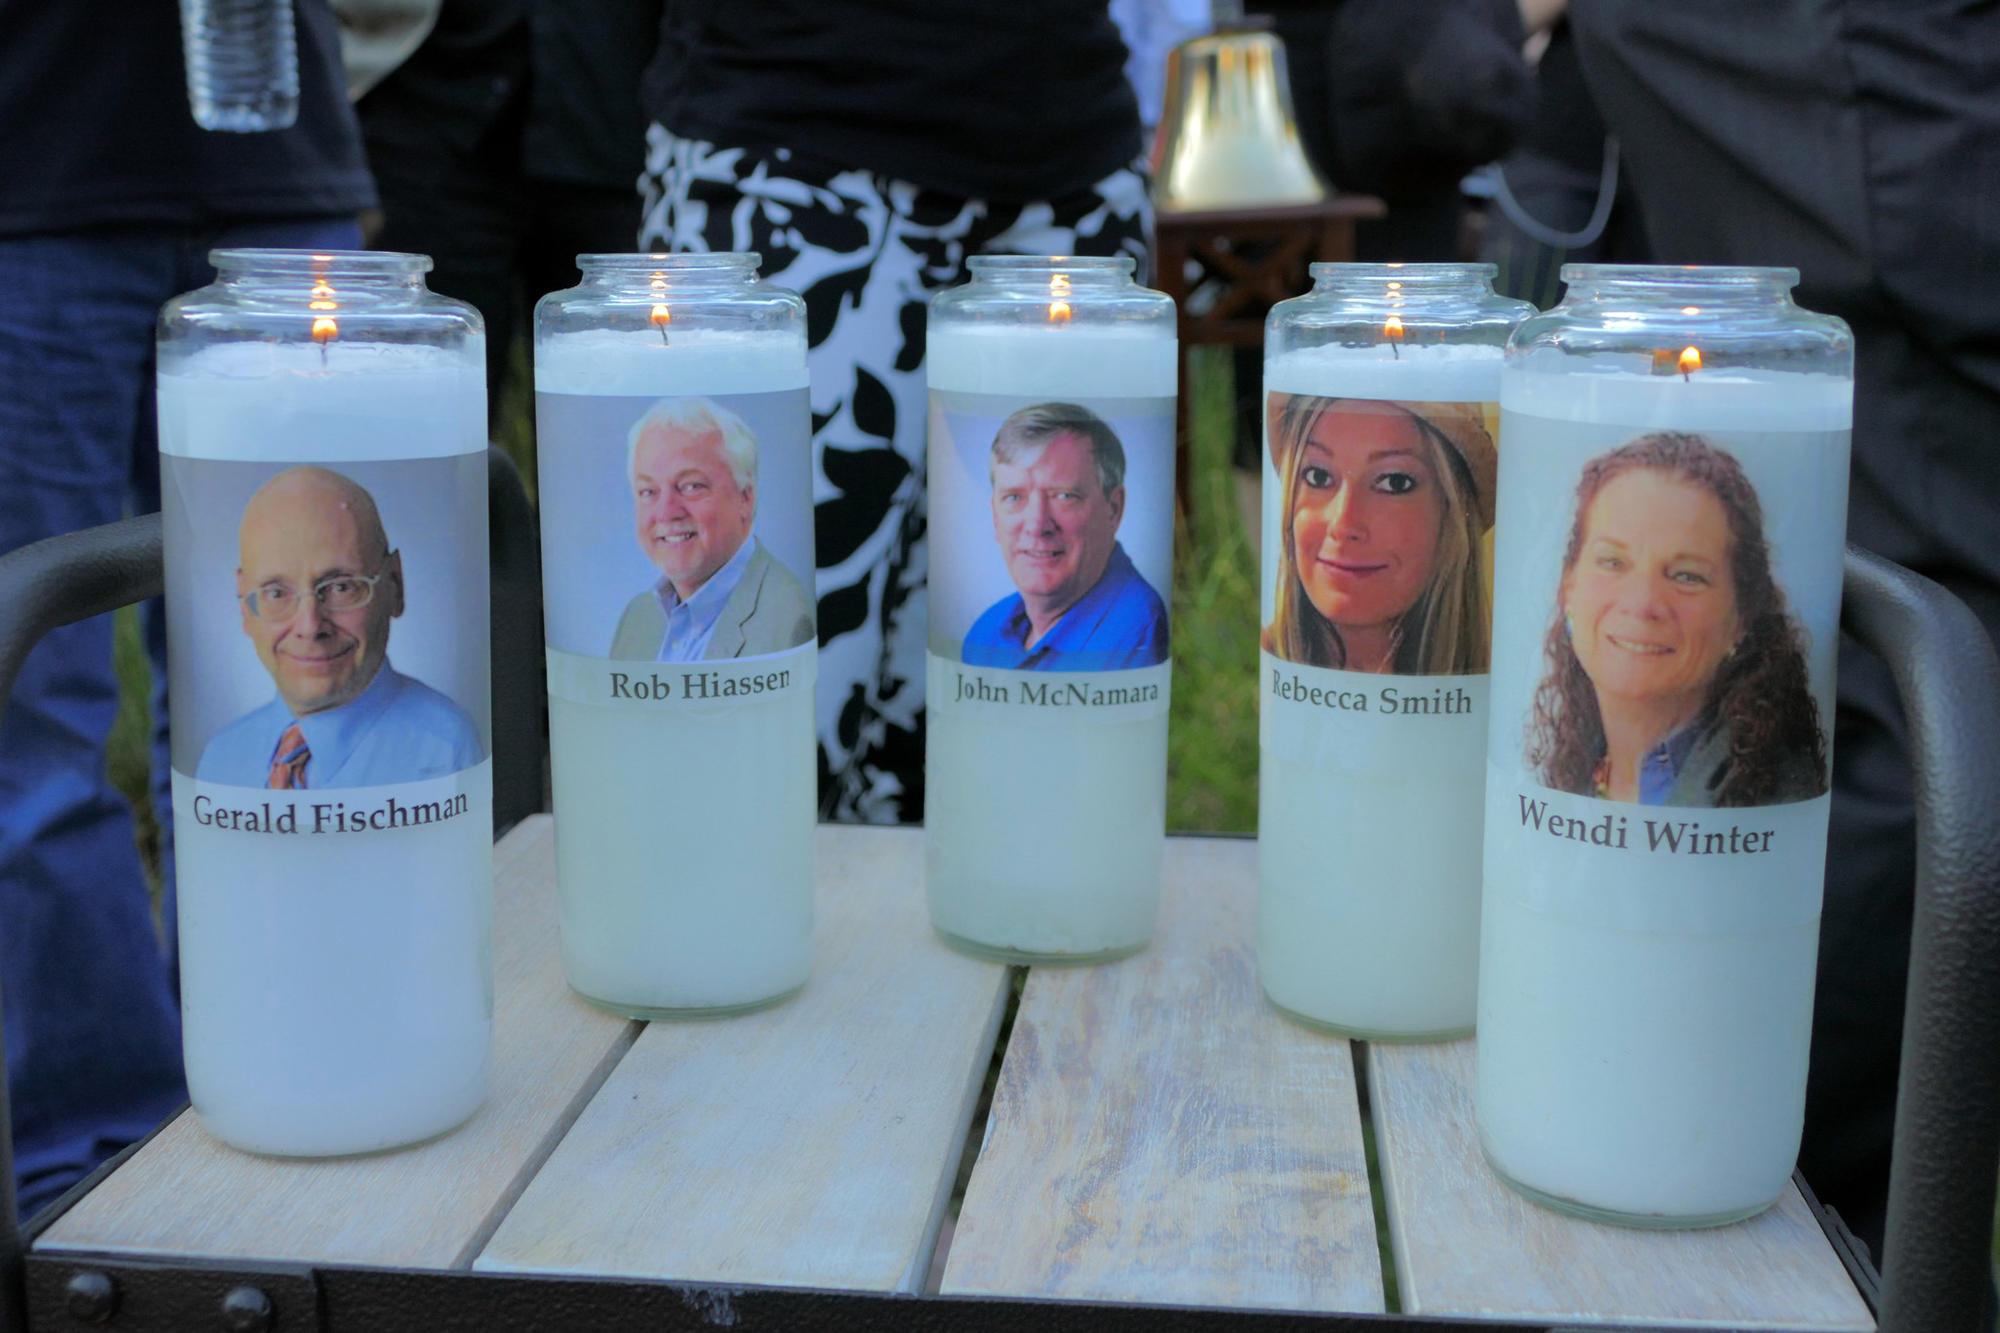 Novelist Laura Lippman dedicates 'Lady In The Lake' to victims of Capital Gazette newsroom attack